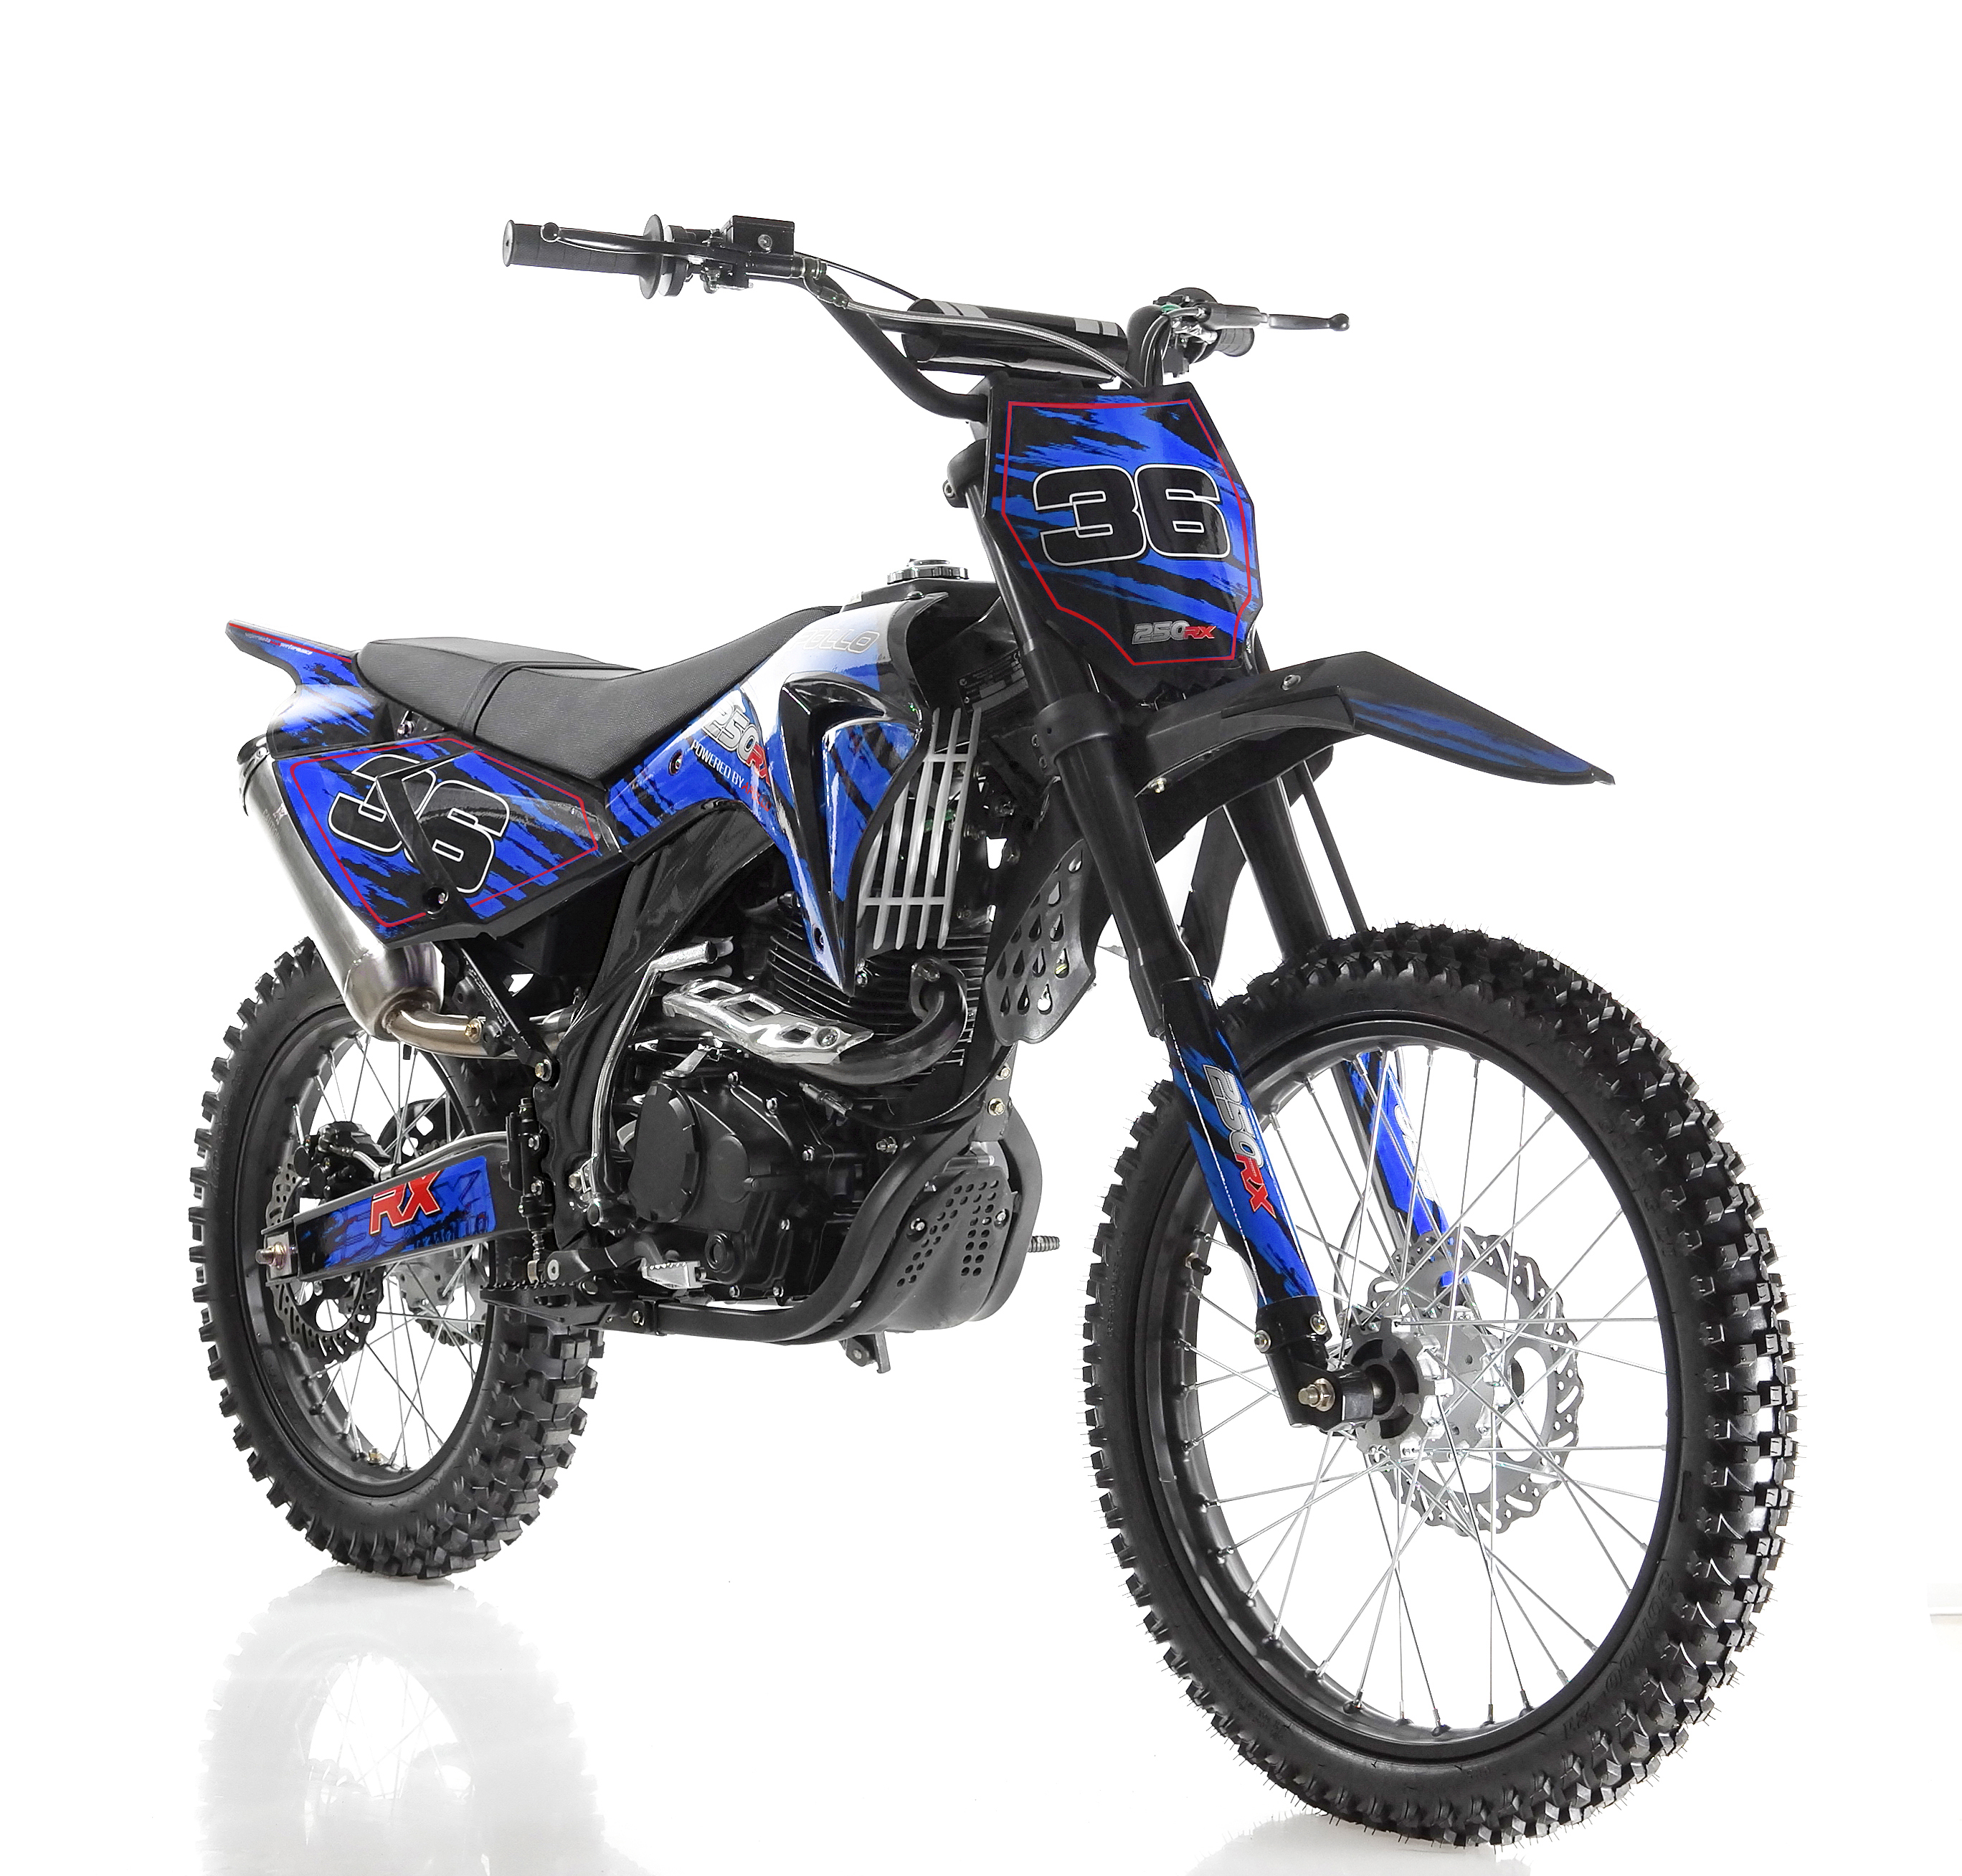 "APOLLO DB-36 250cc Dirt Bike with 5 Speed Manual Transmission, Big 21""/18"" Wheels!"